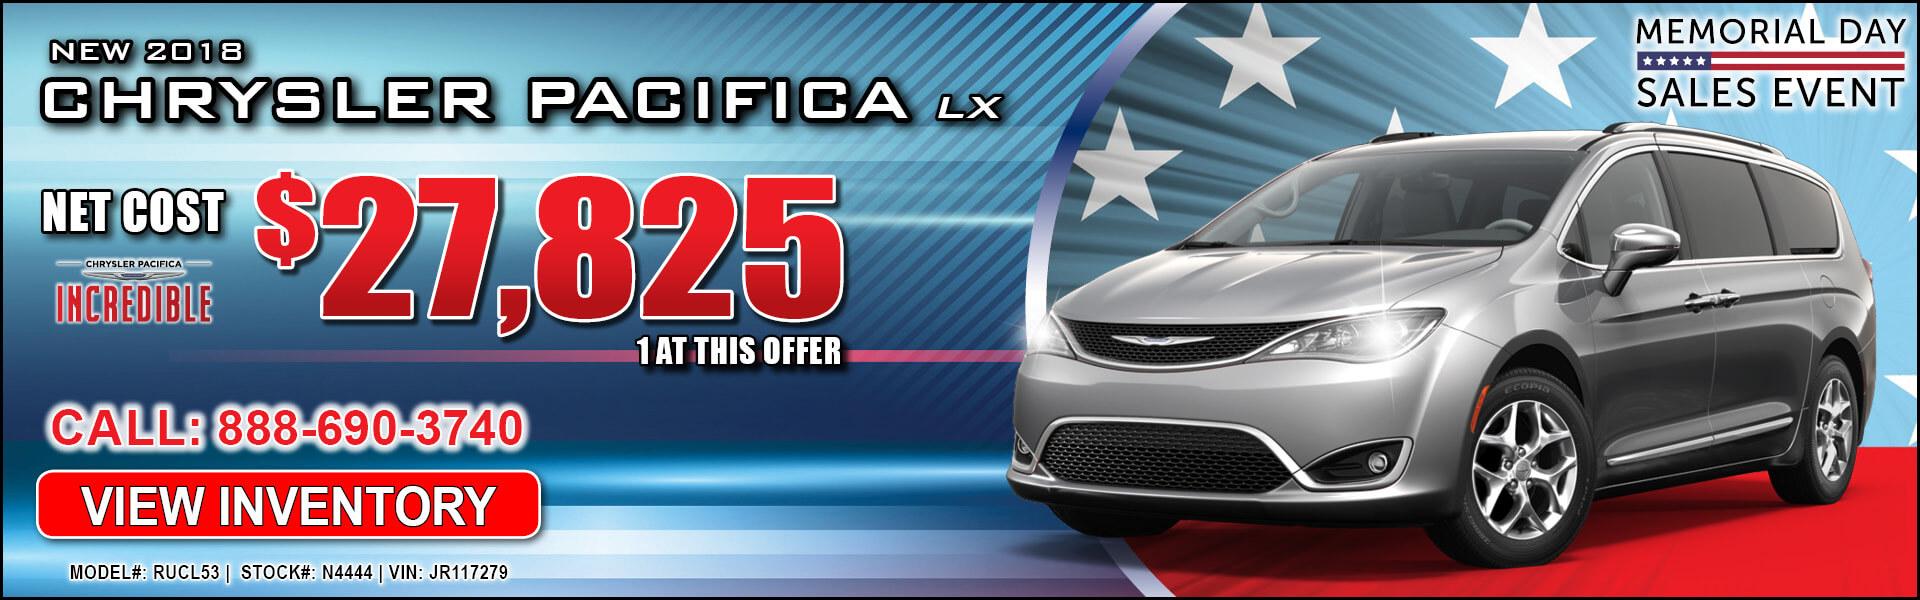 Chrysler Pacifica $27,825